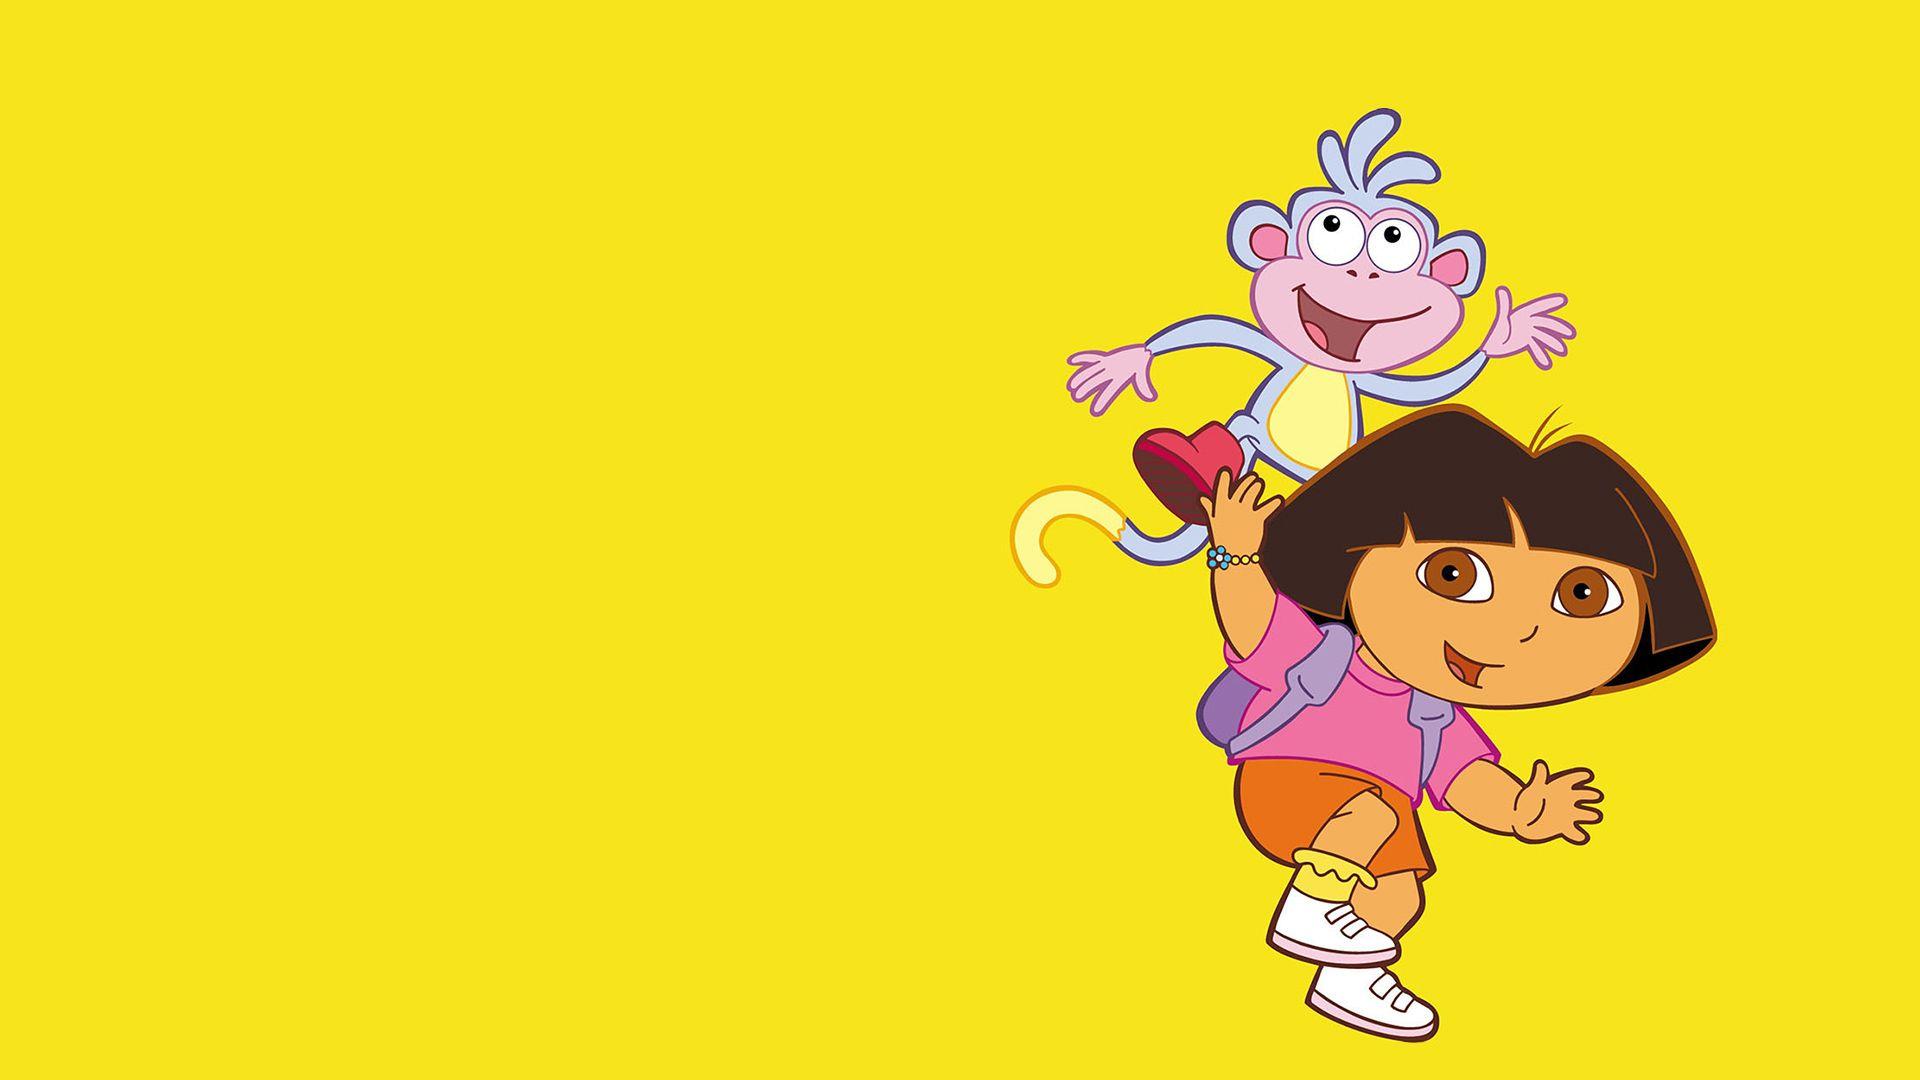 Dora background wallpaper